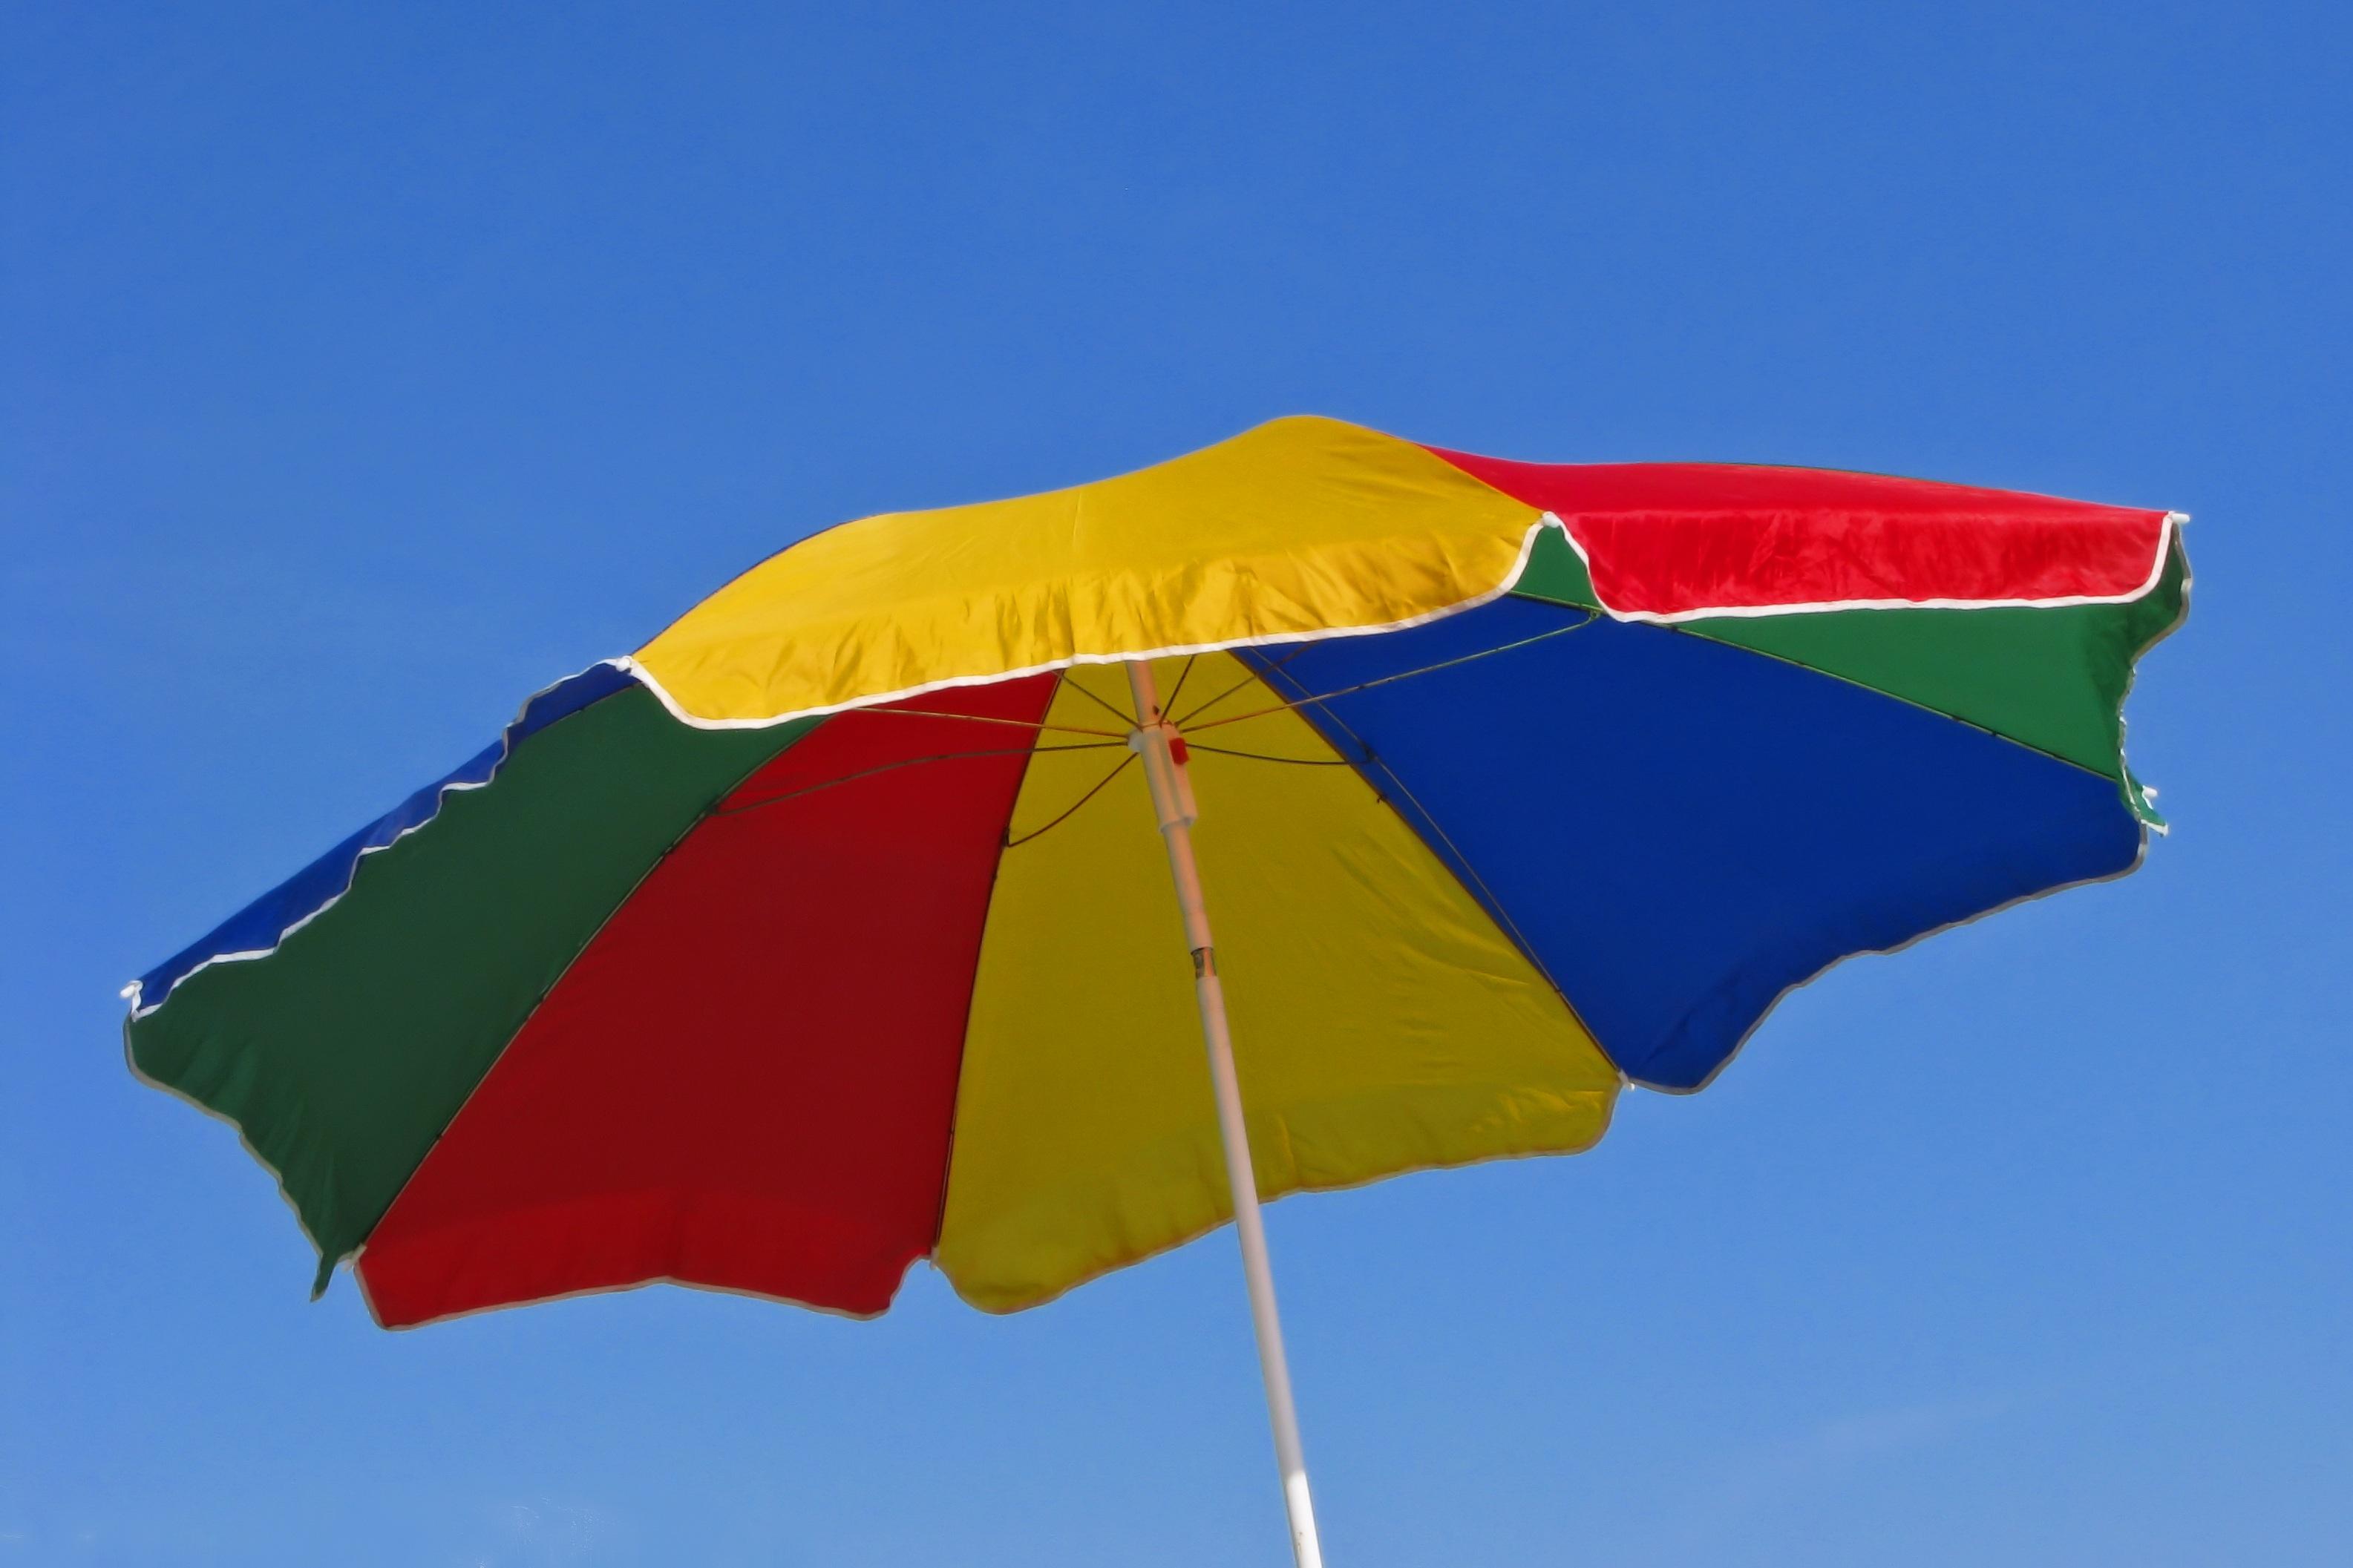 Parasol Deporte Abri Jardin Bois France